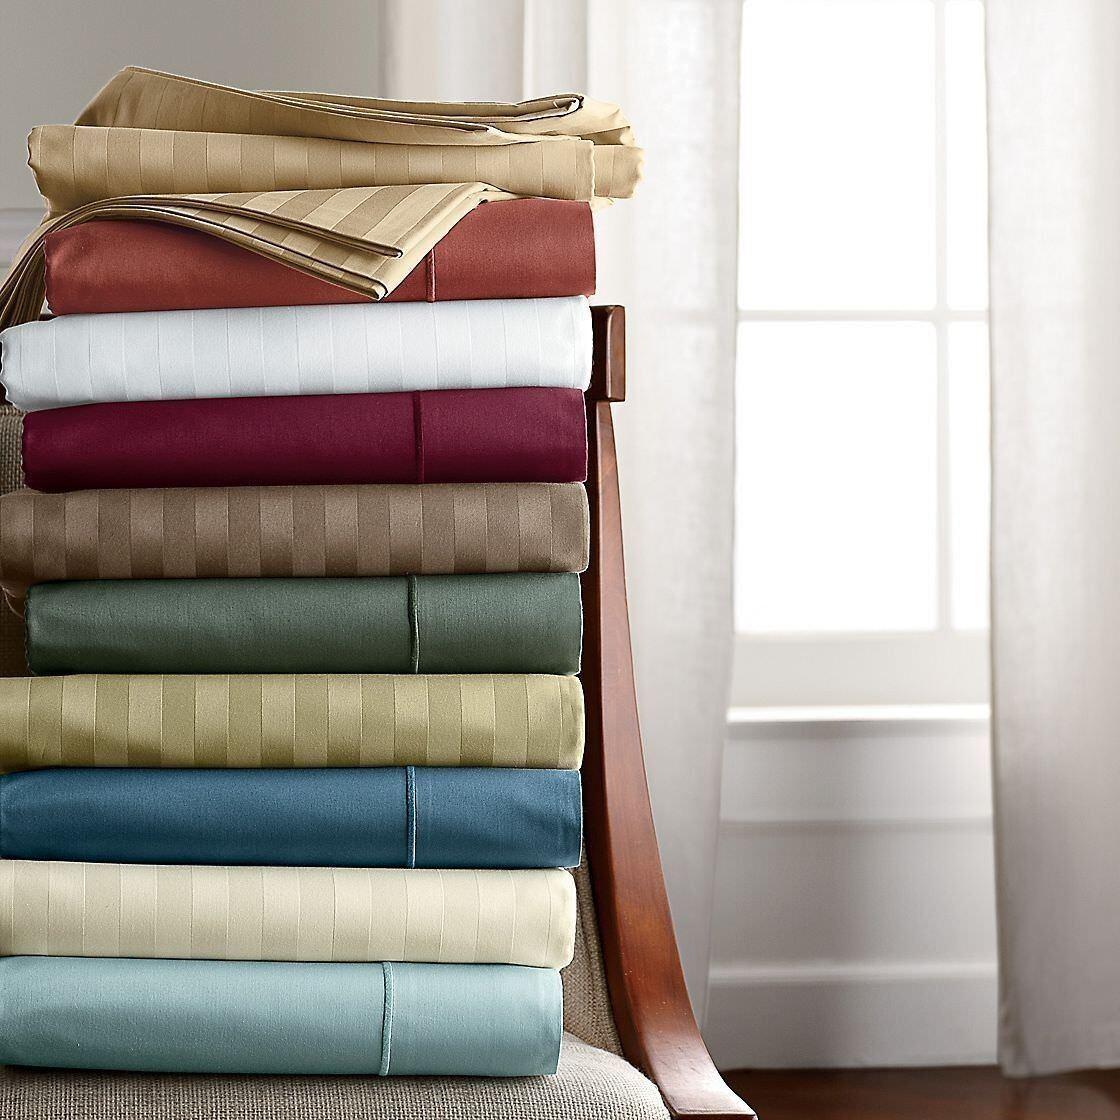 1000TC 100% Egyptian Cotton 1PC Duvet Cover All US Sizes & Stripe colors